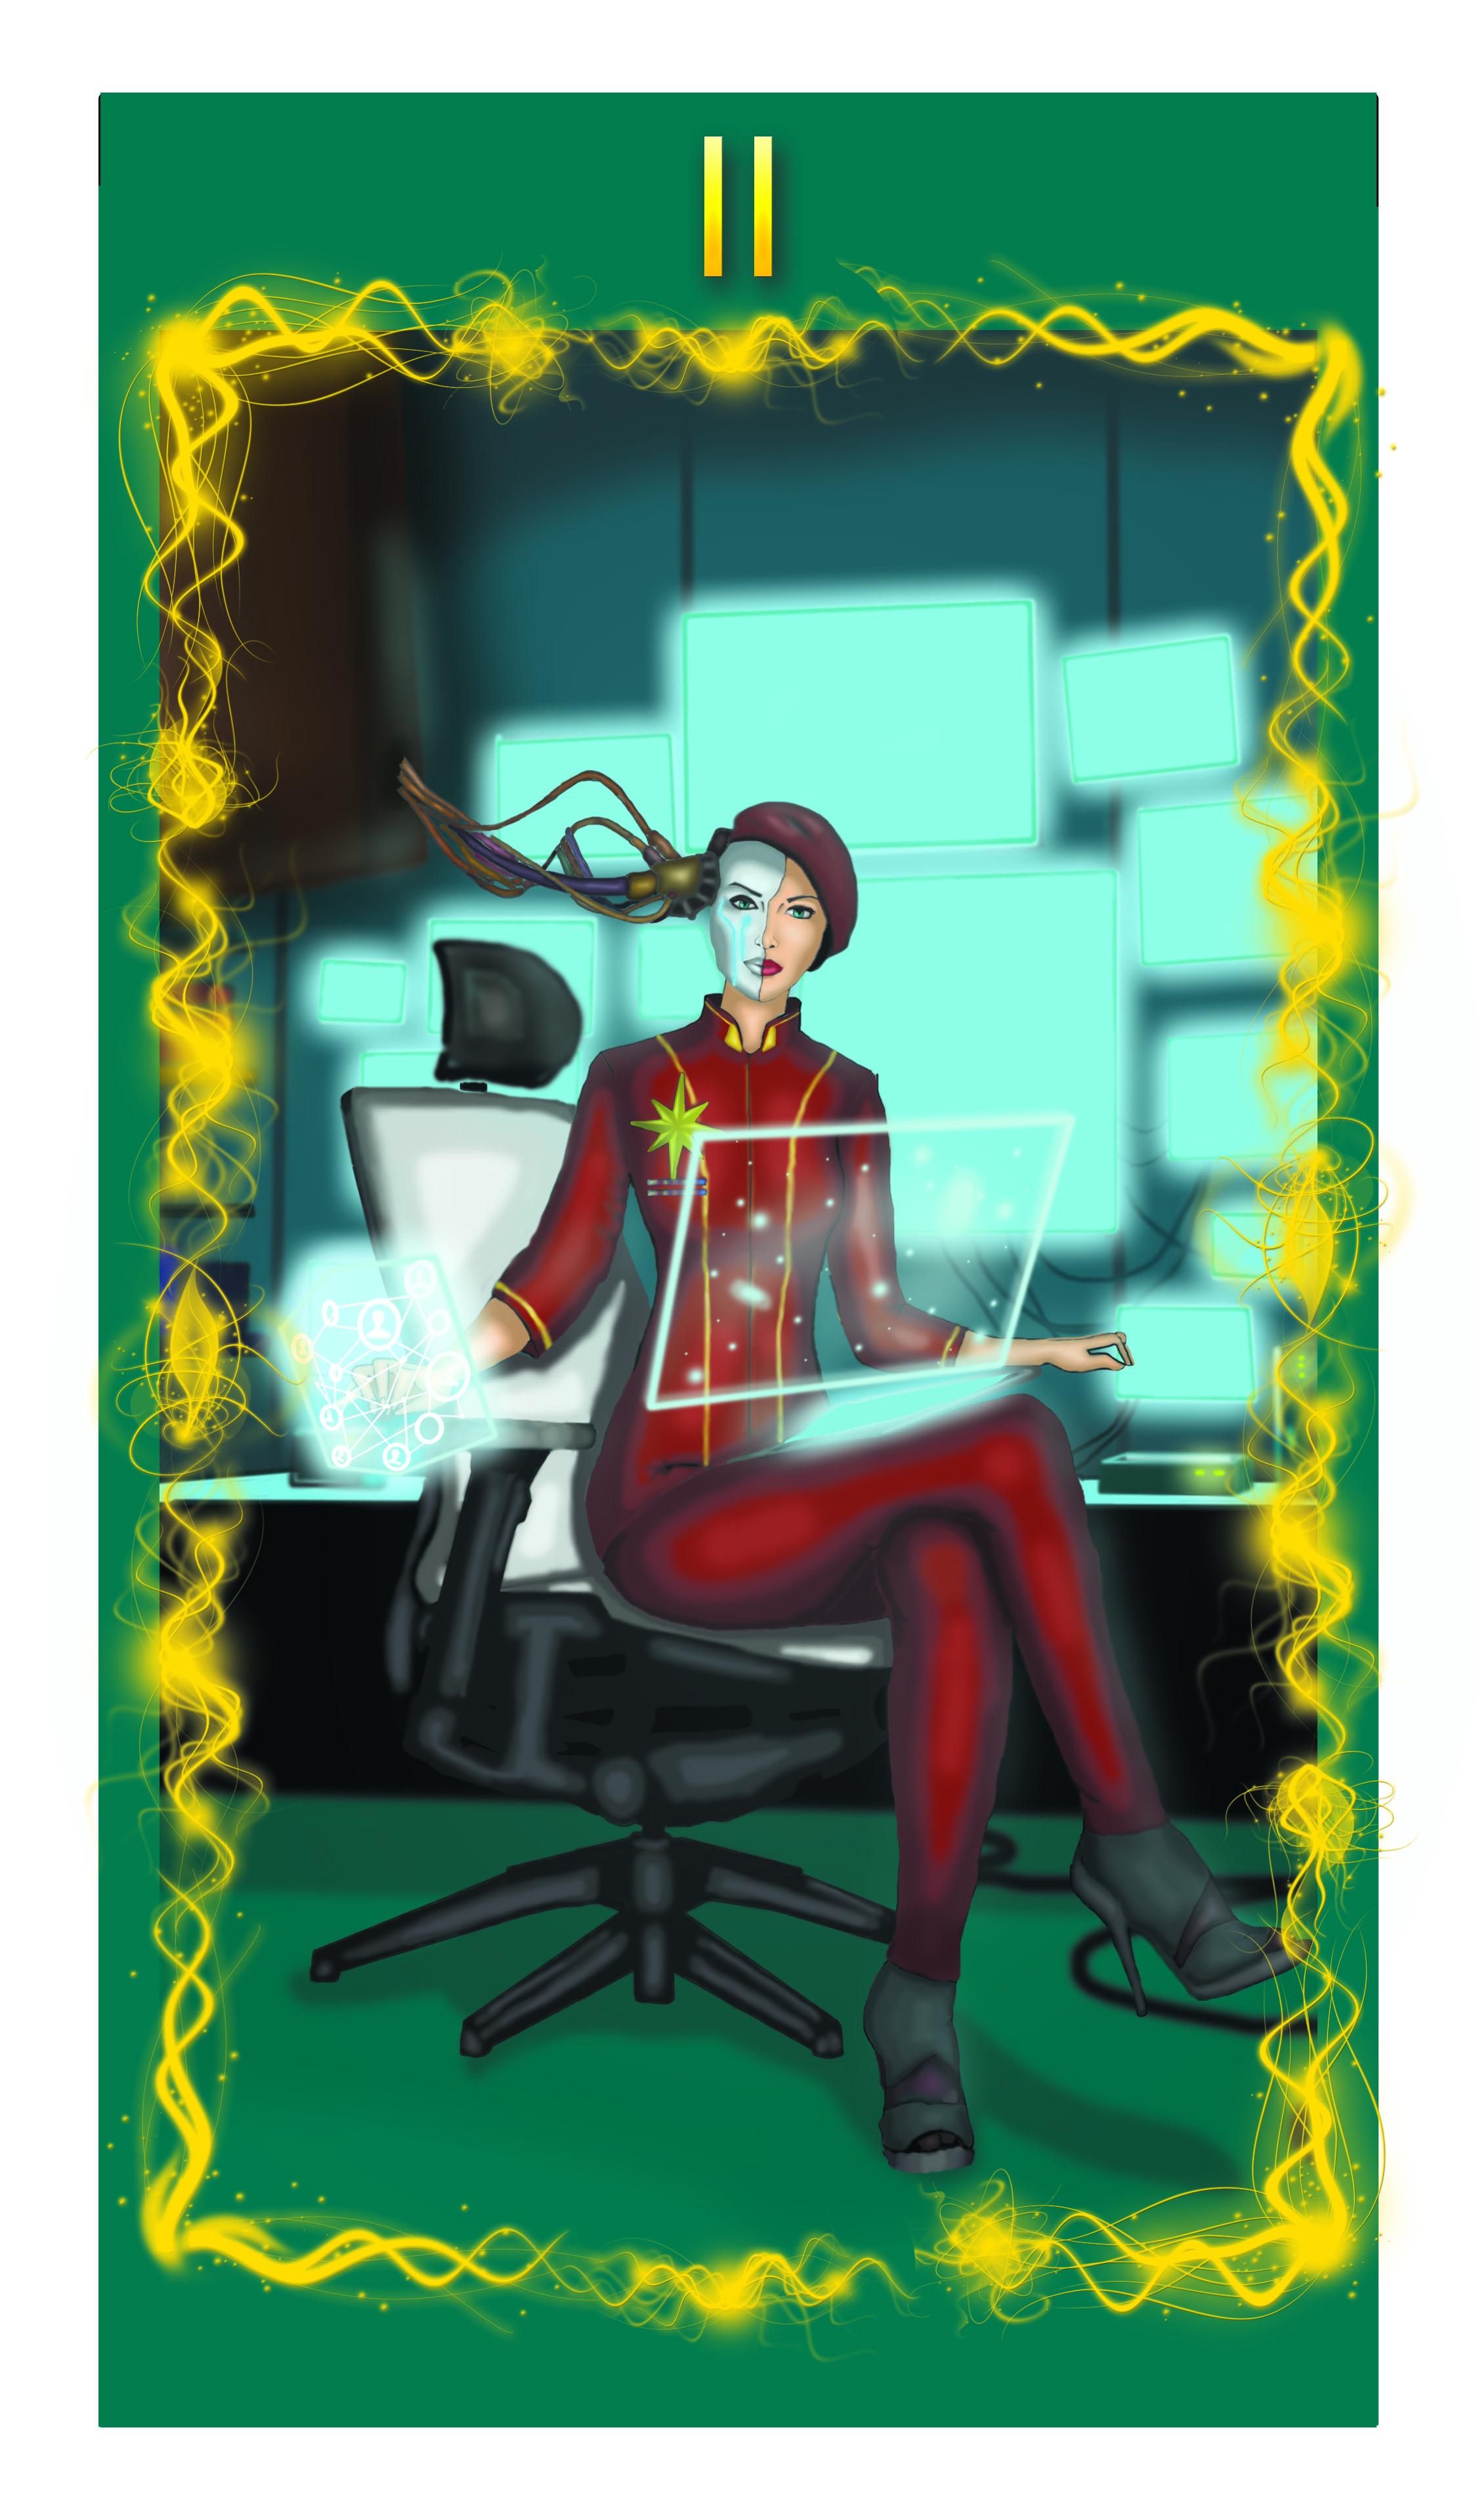 Ищем художника для создания колоды Таро в стиле киберпанк фото f_93758fb5913e577b.jpg